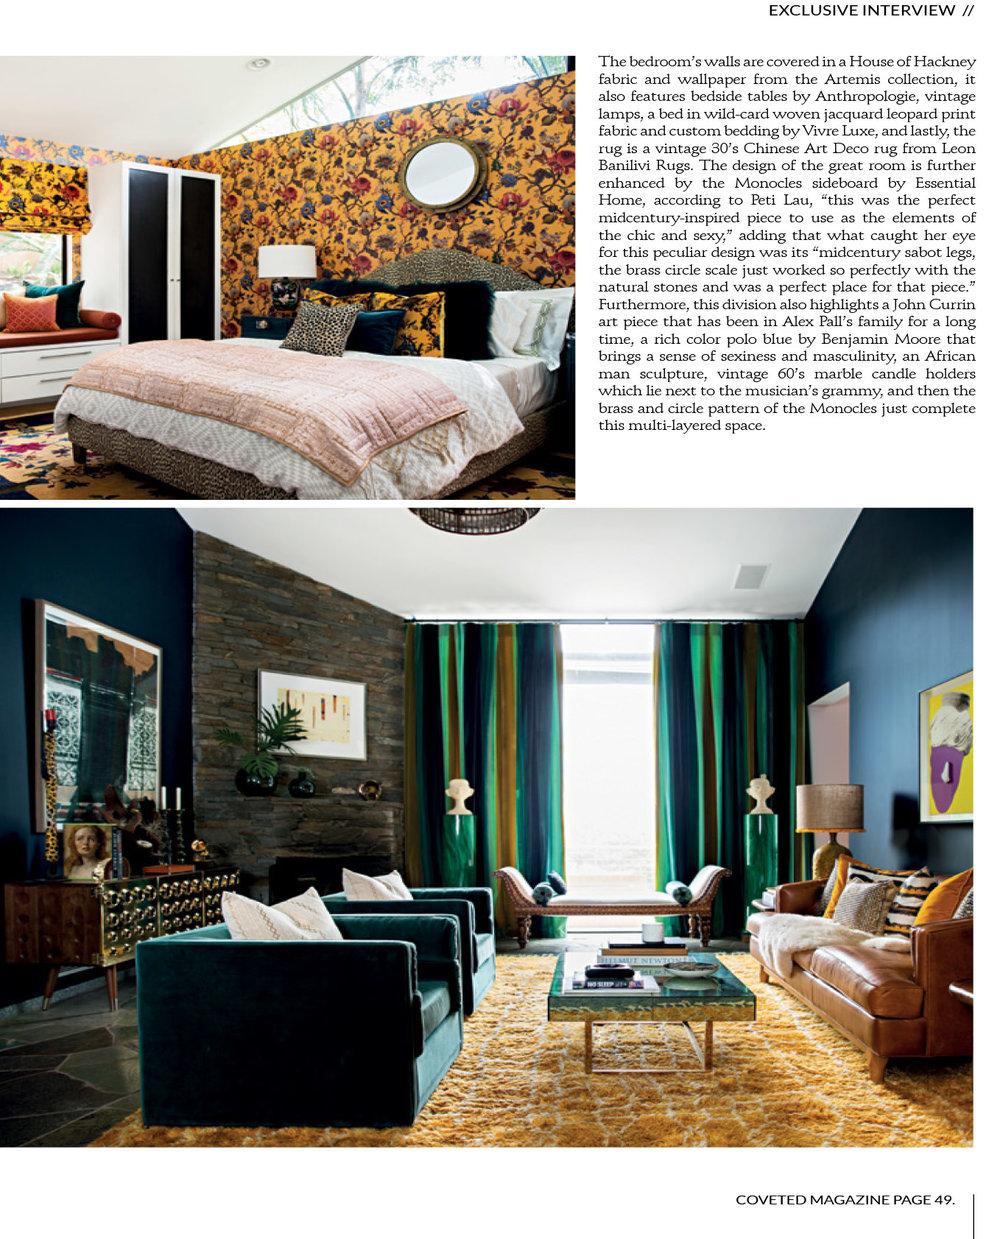 Covet-Edition-Magazine-11th-Edition-49.jpg